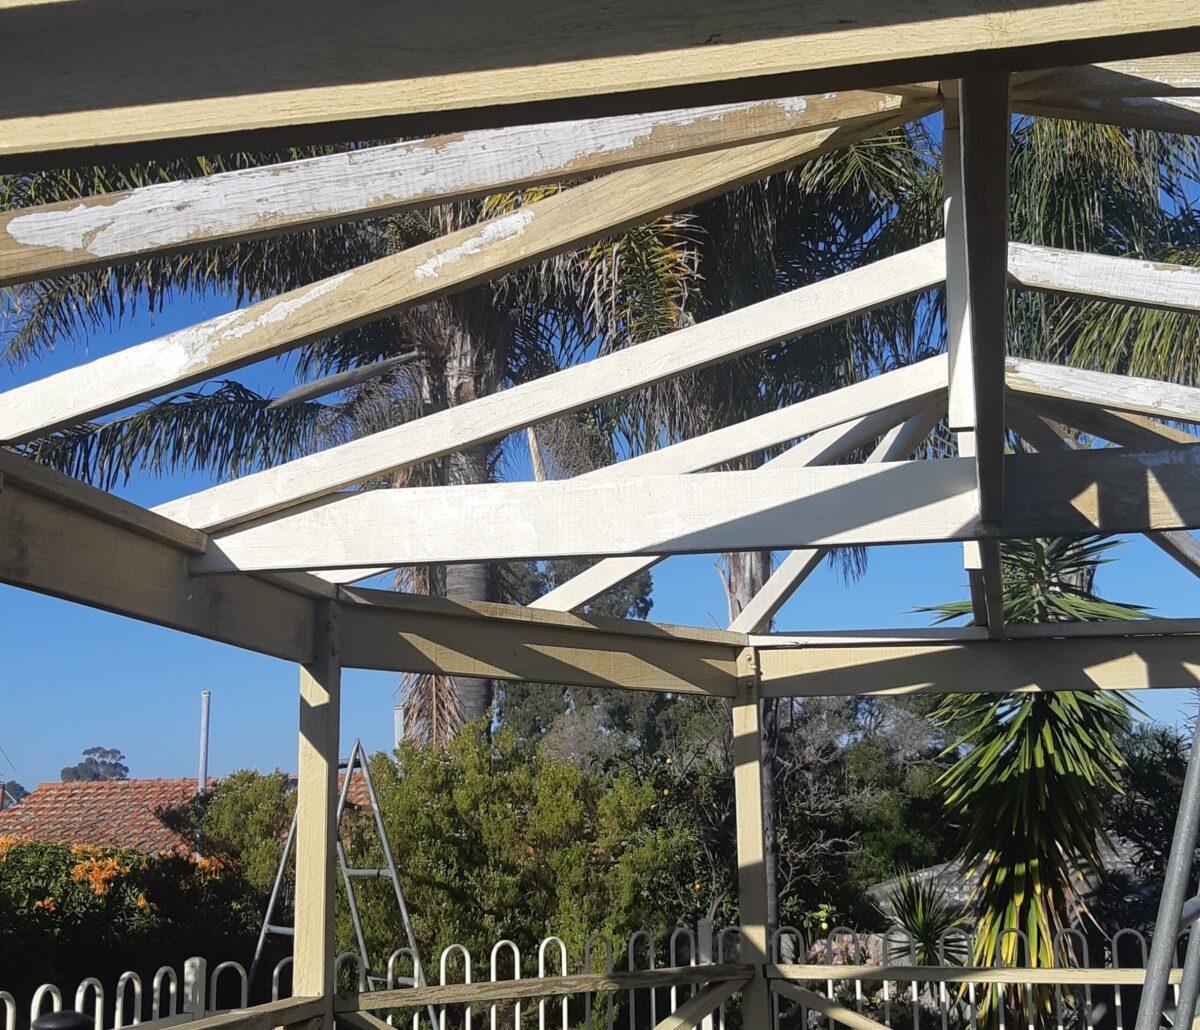 Fill timber cracks with exterior grade filler then paint